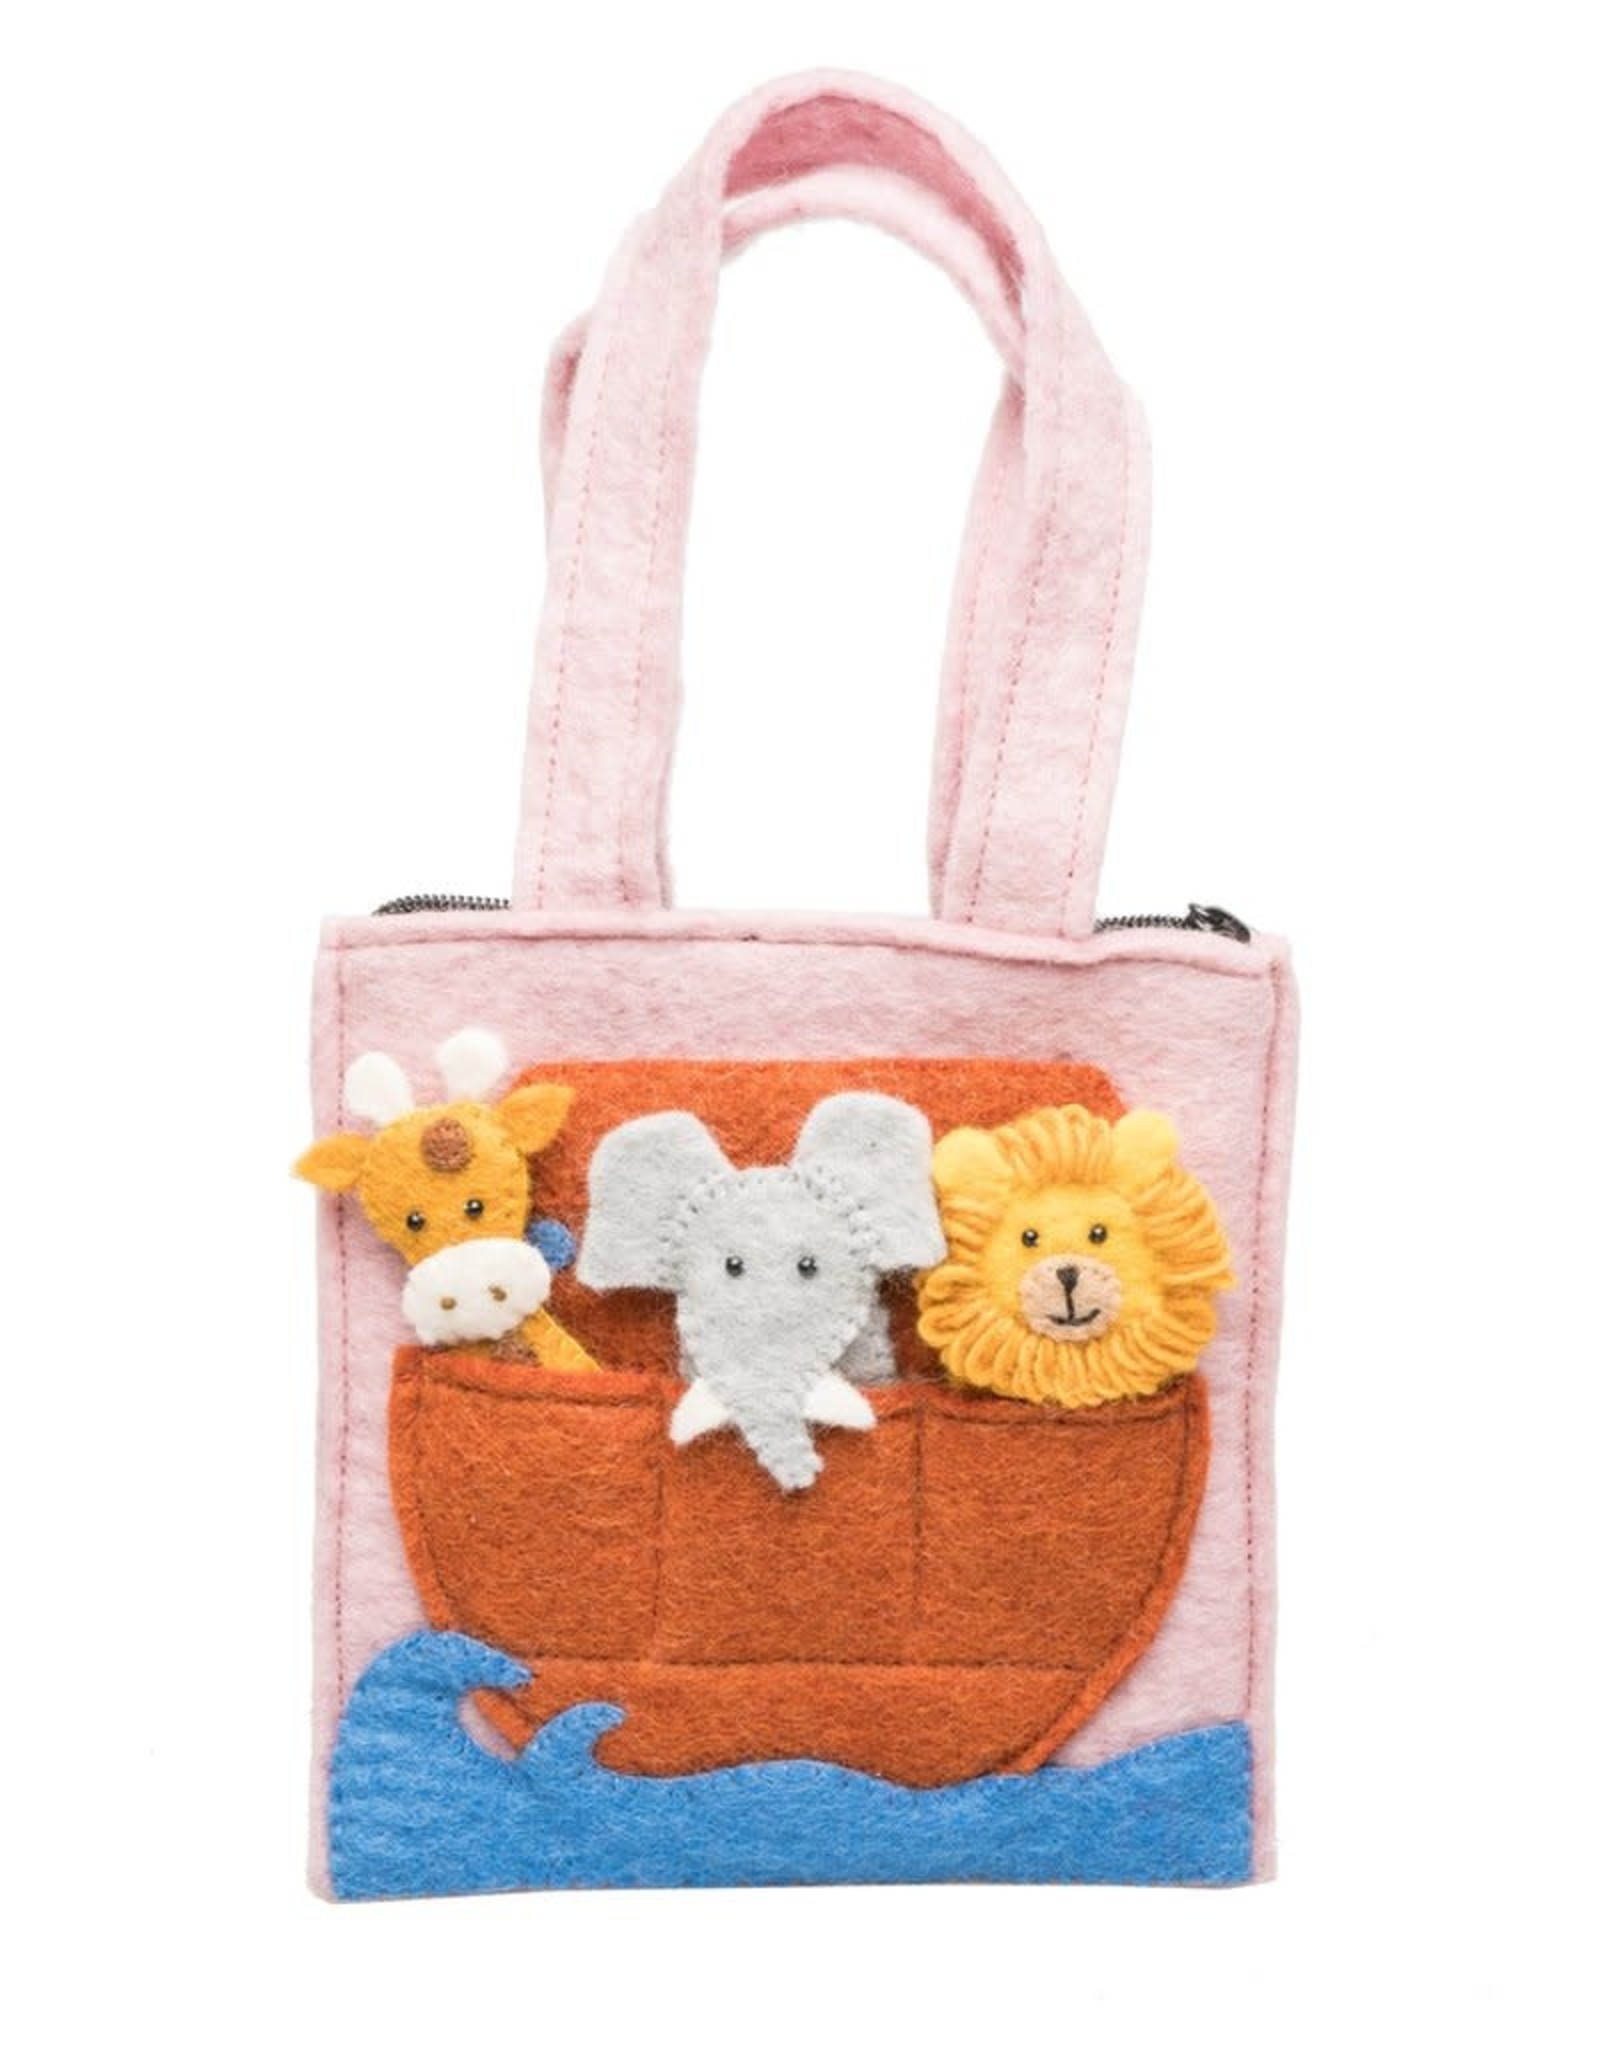 Noah's Ark Felt Puppet Bag